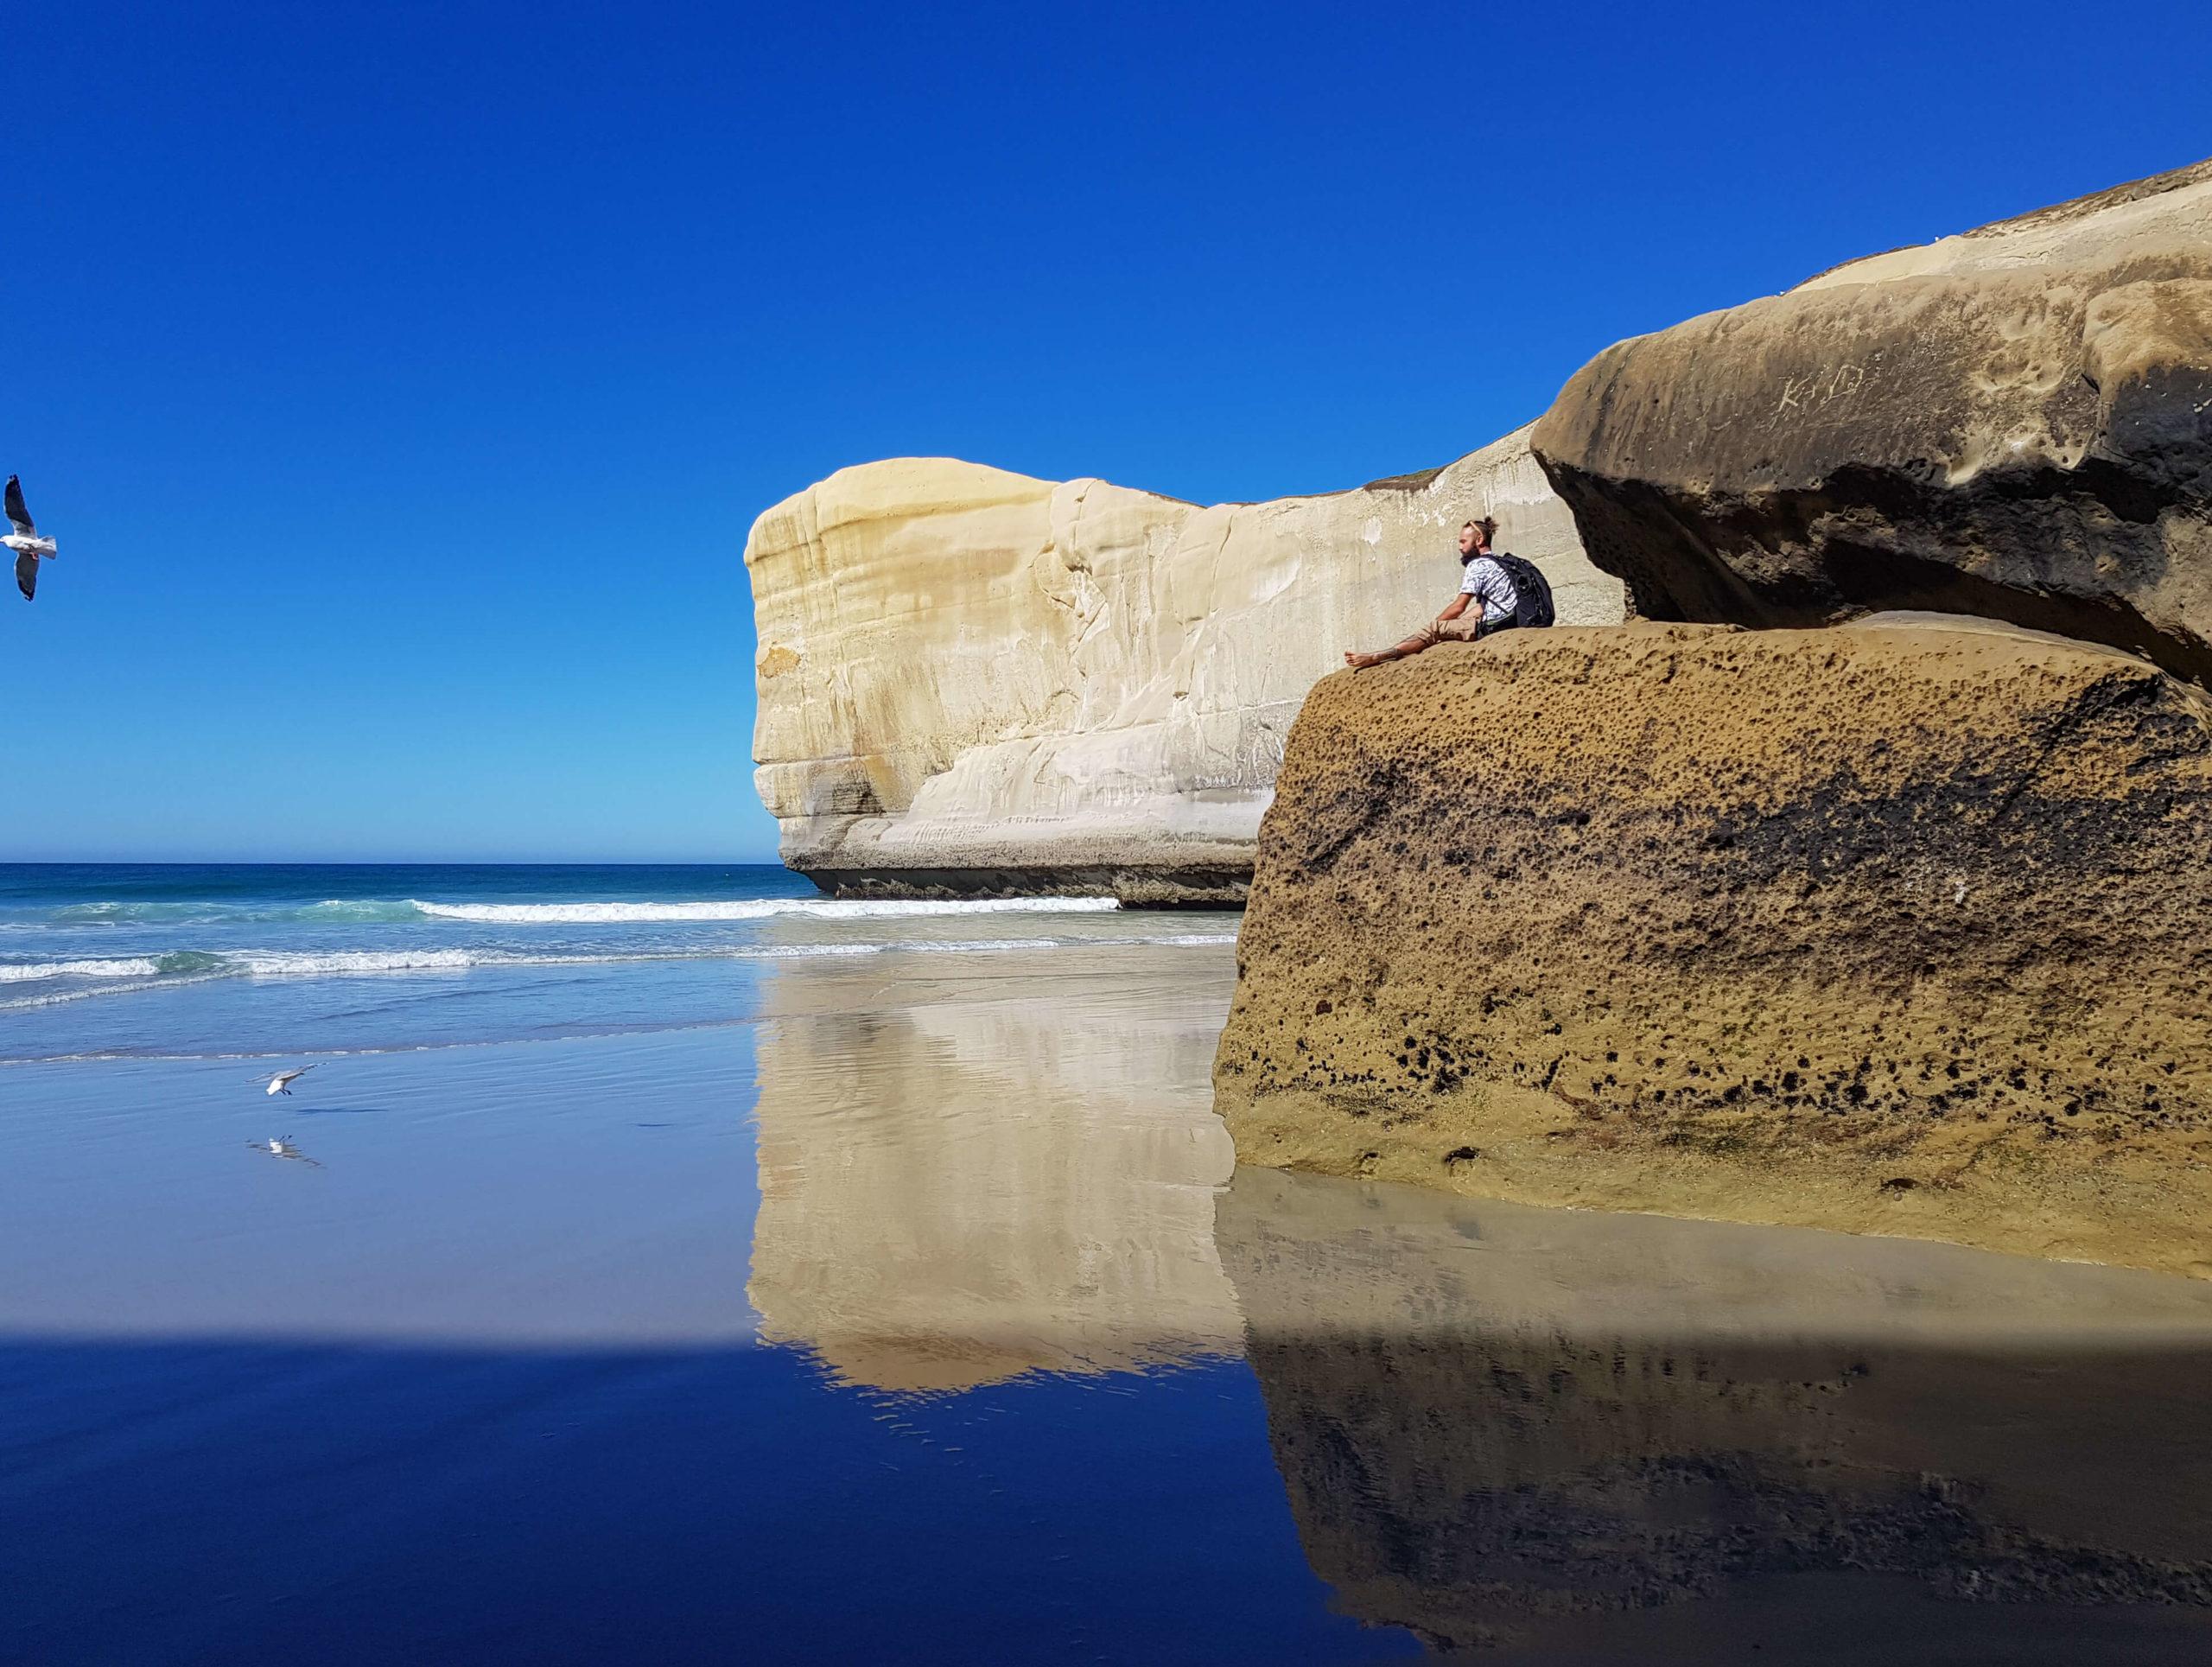 Maroudeur Tunnel beach Nouvelle-Zélande